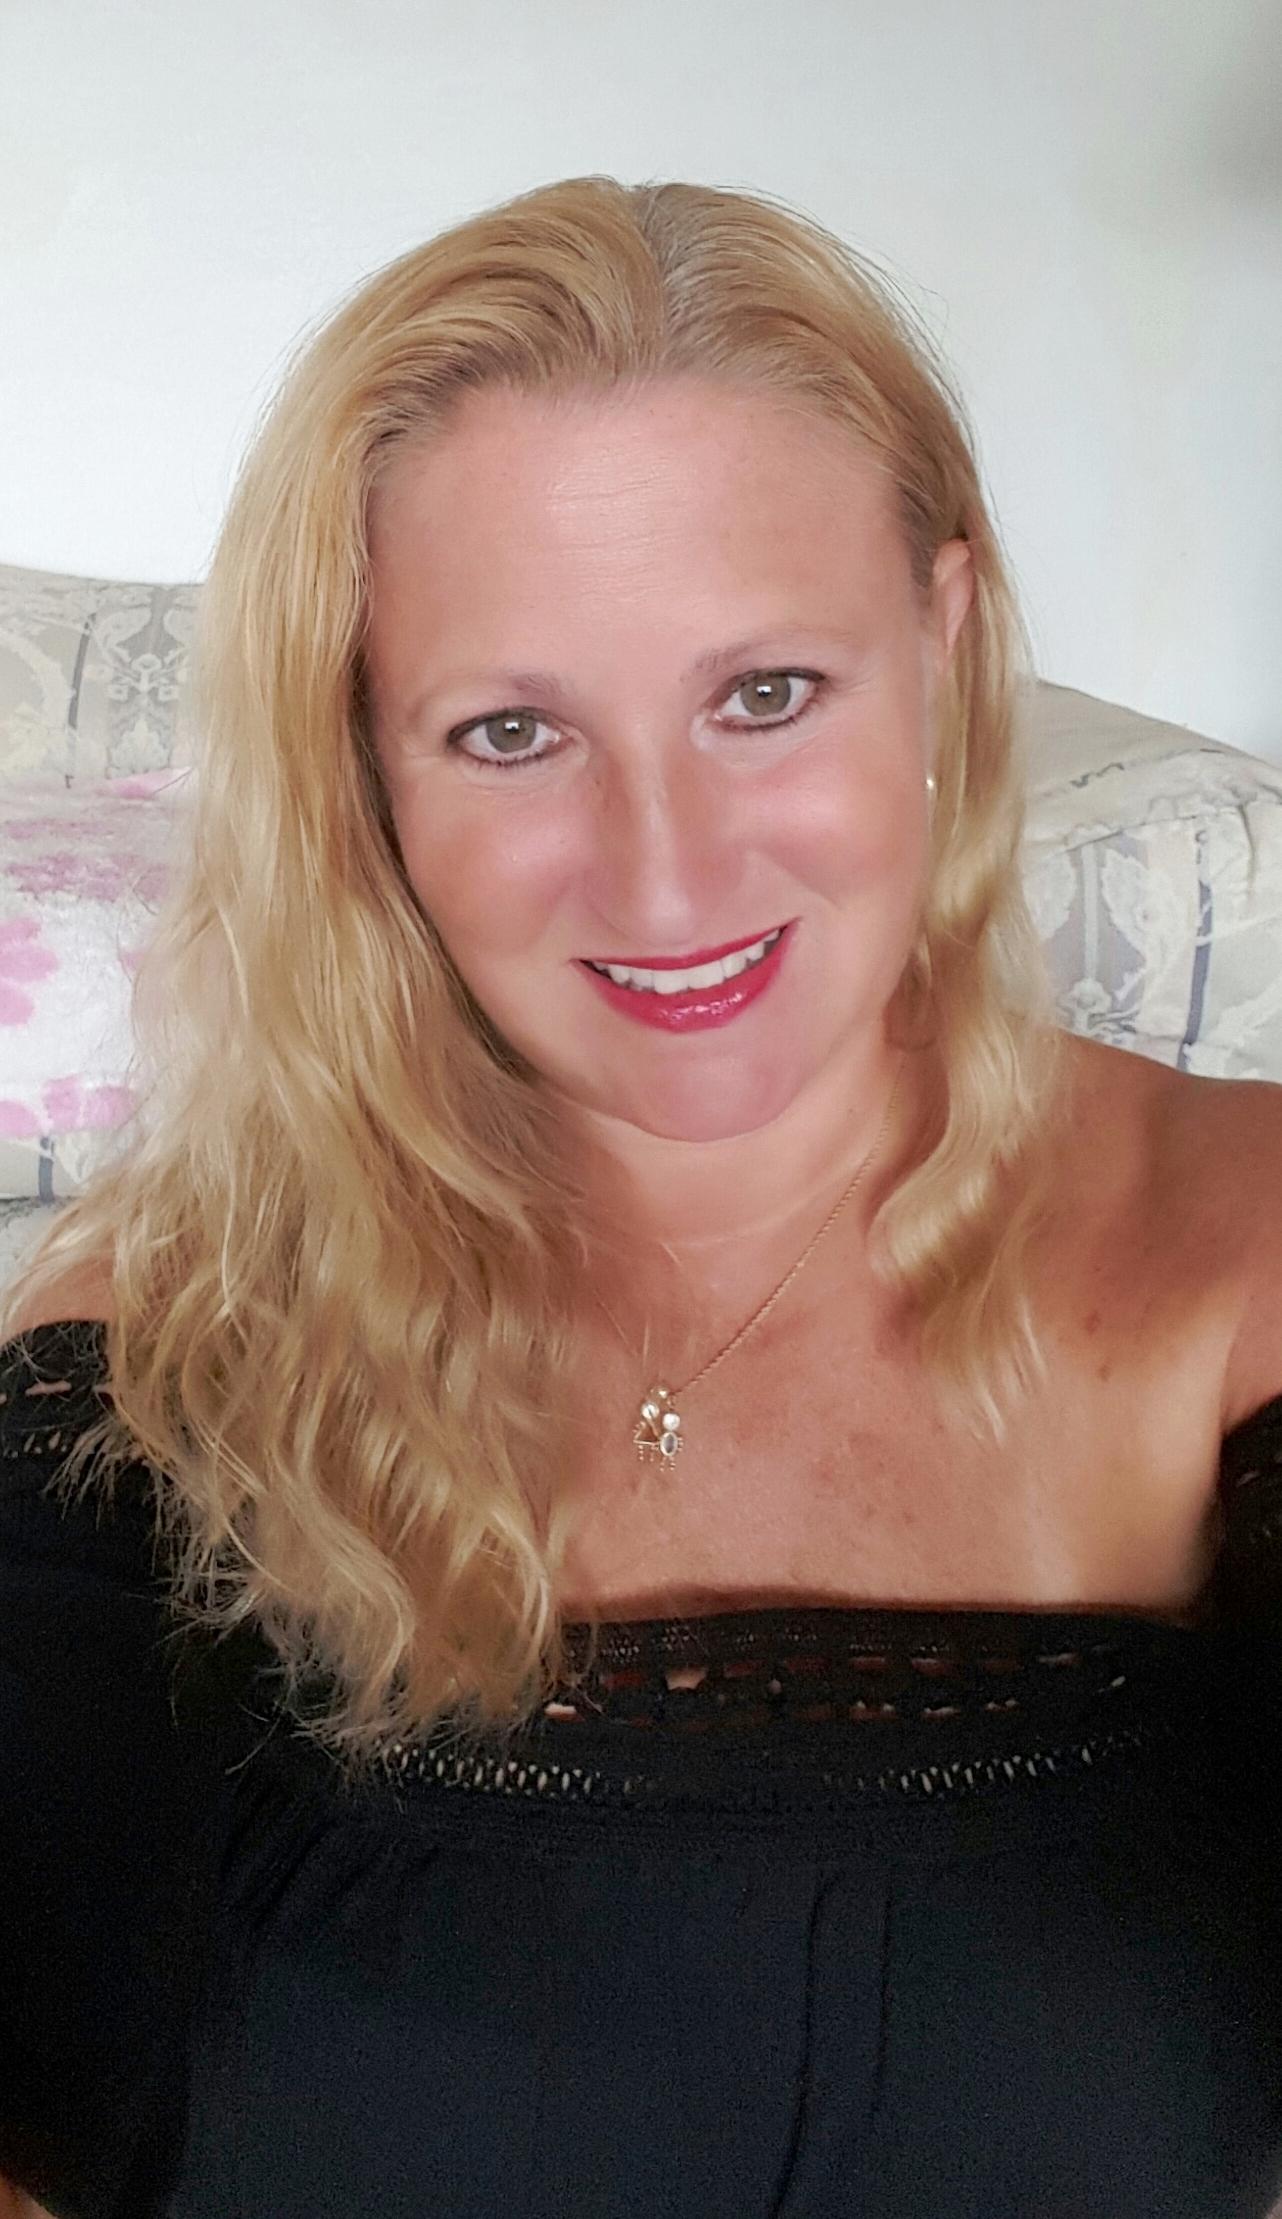 The artist, Jill Hardiman